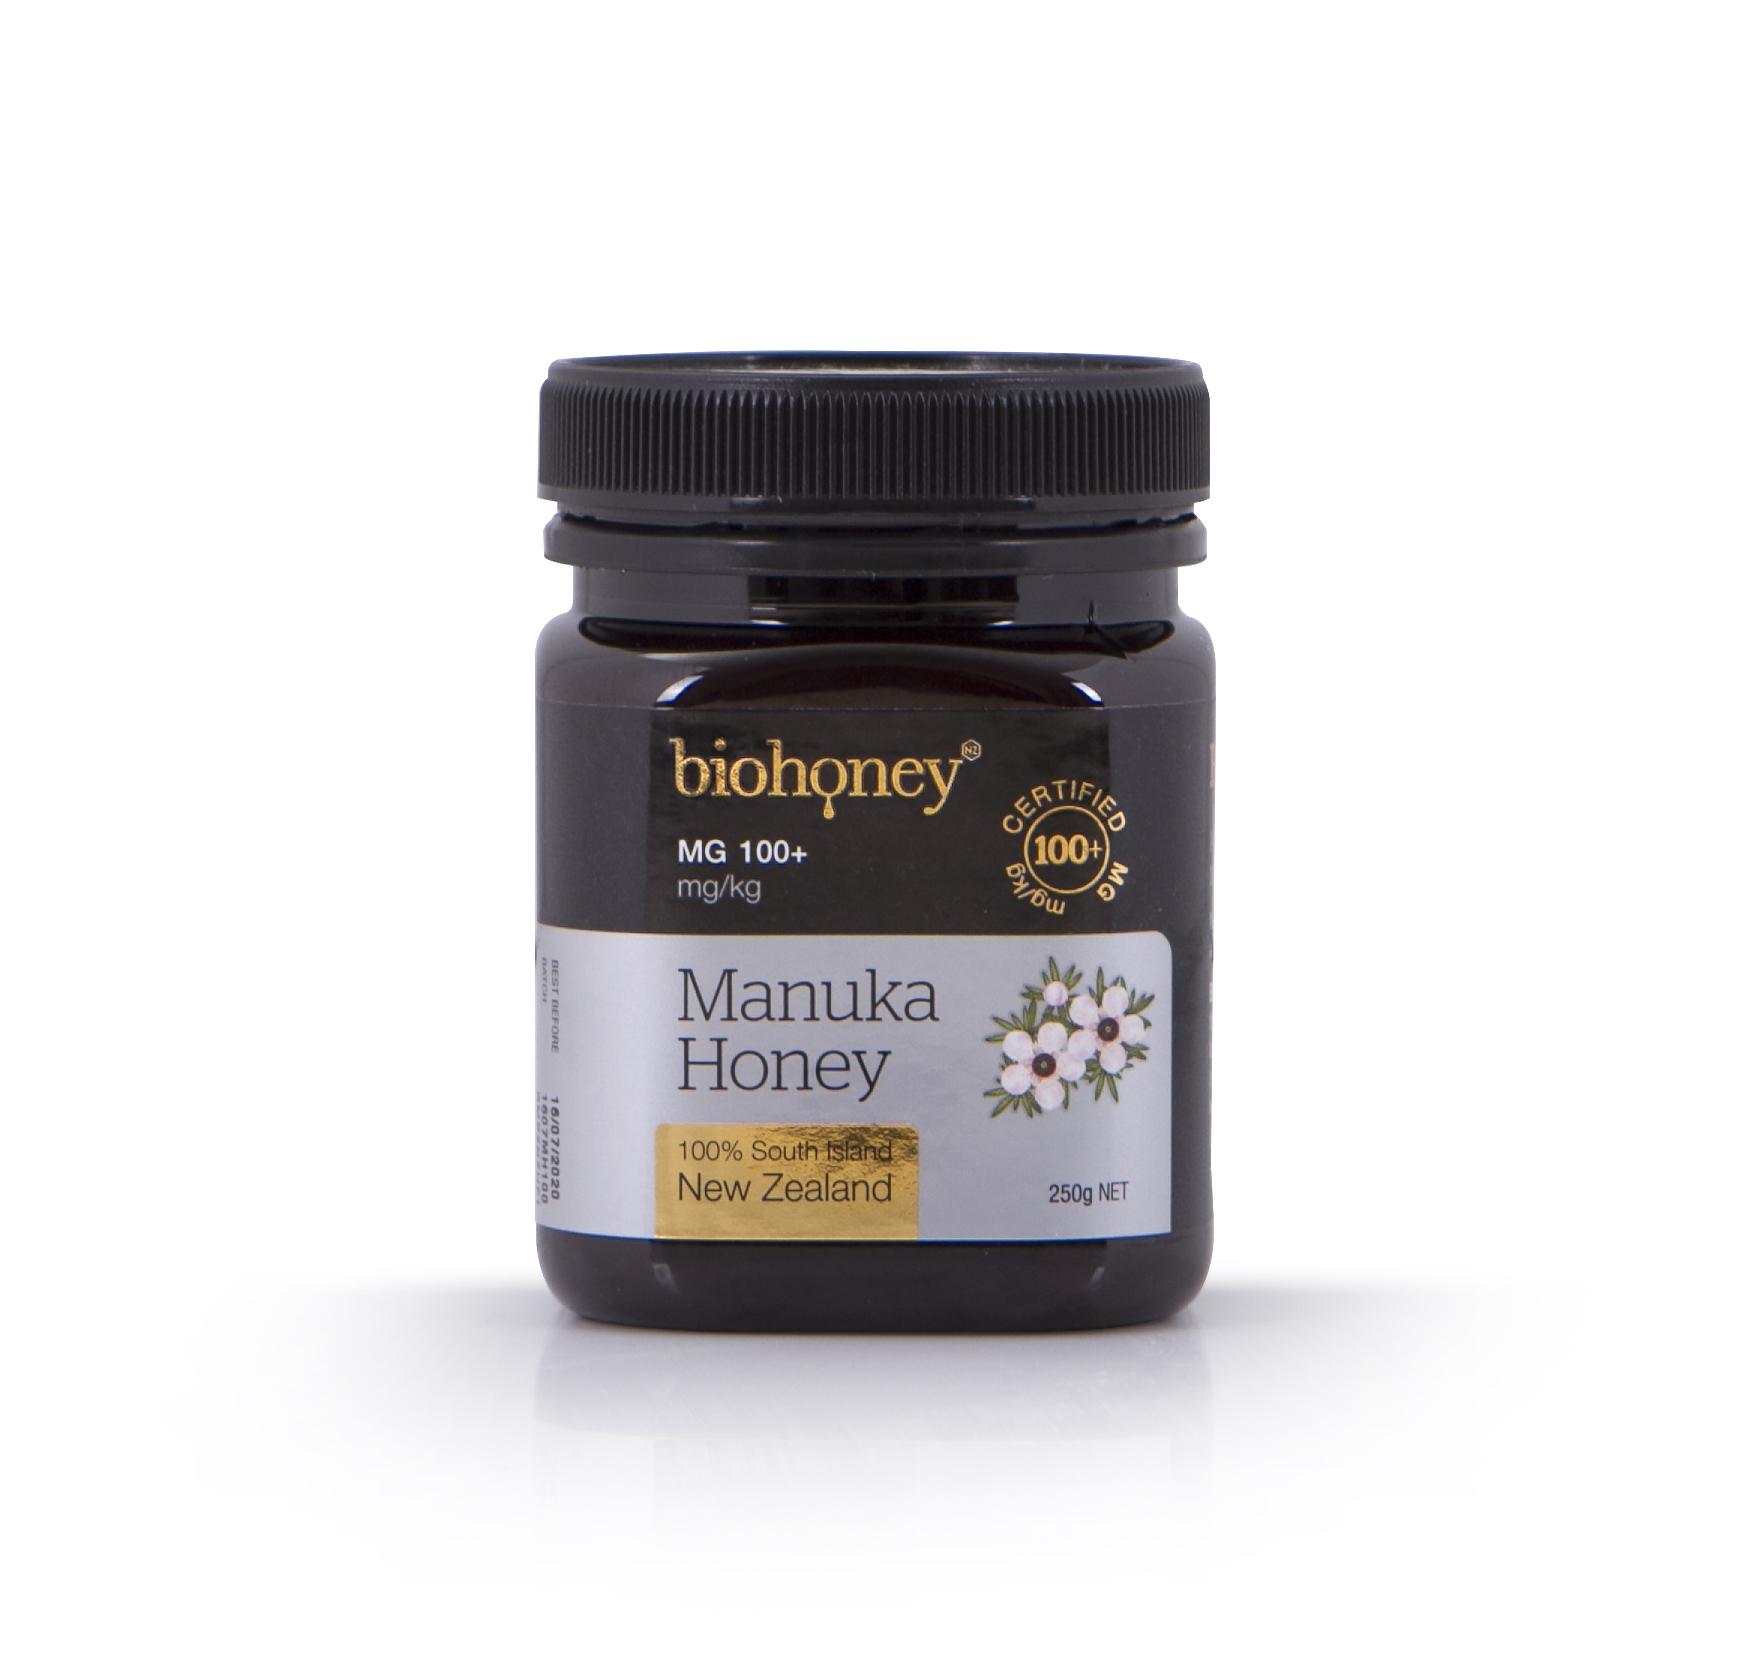 Biohoney Organic Manuka Honey from NZ - Certified MG 100+